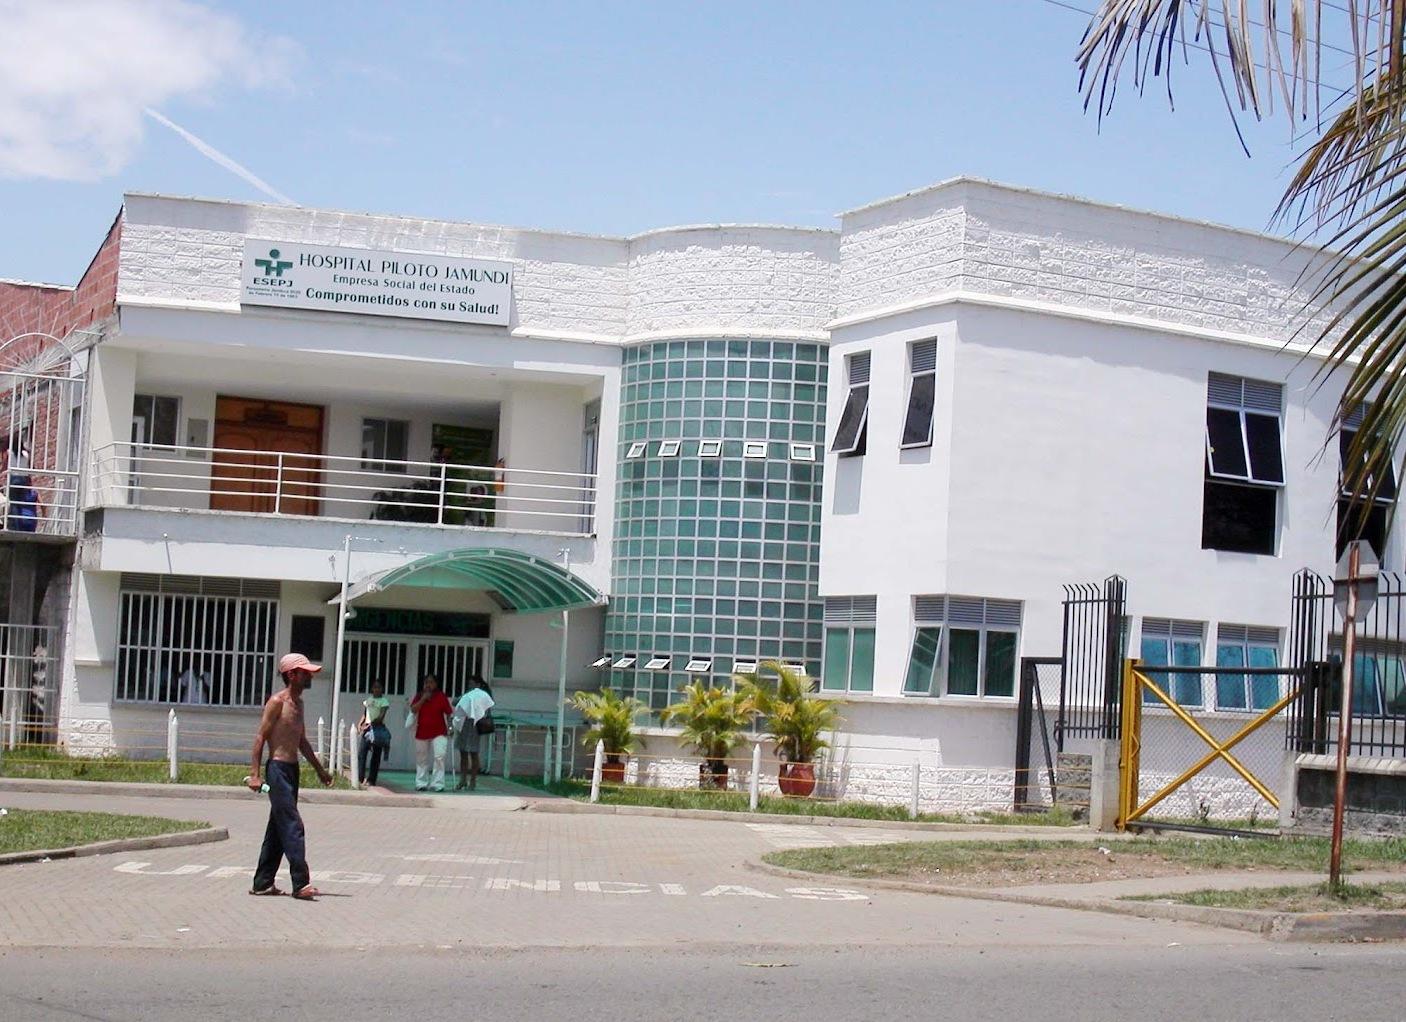 Subgerente del hospital Piloto es enviado a la cárcel